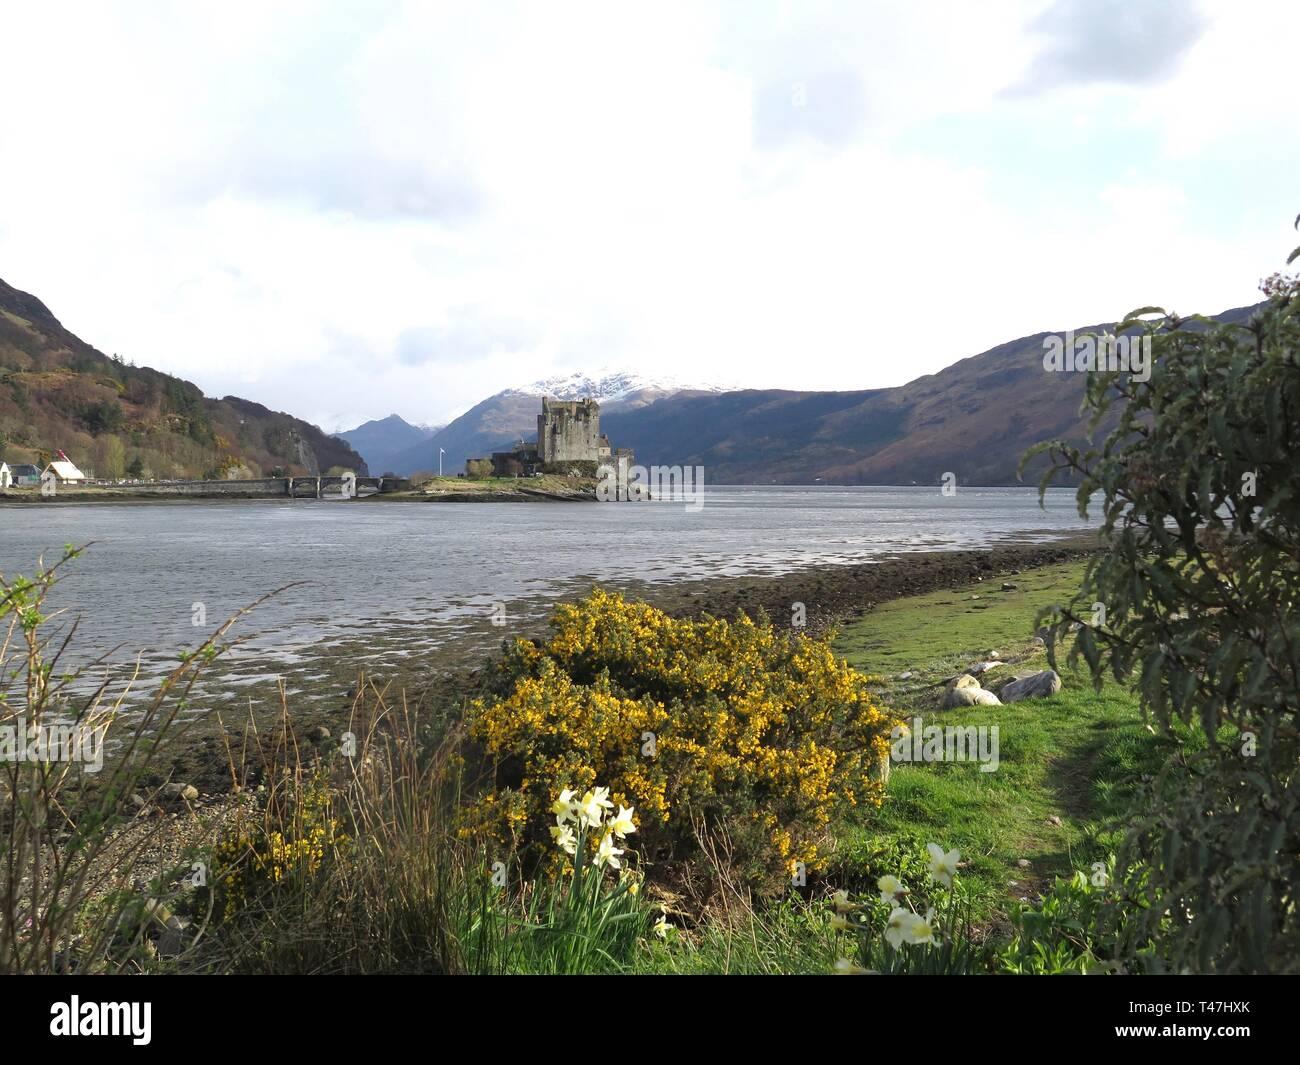 Scotland: Loch Alsh & Eilean Donan Castle - Stock Image